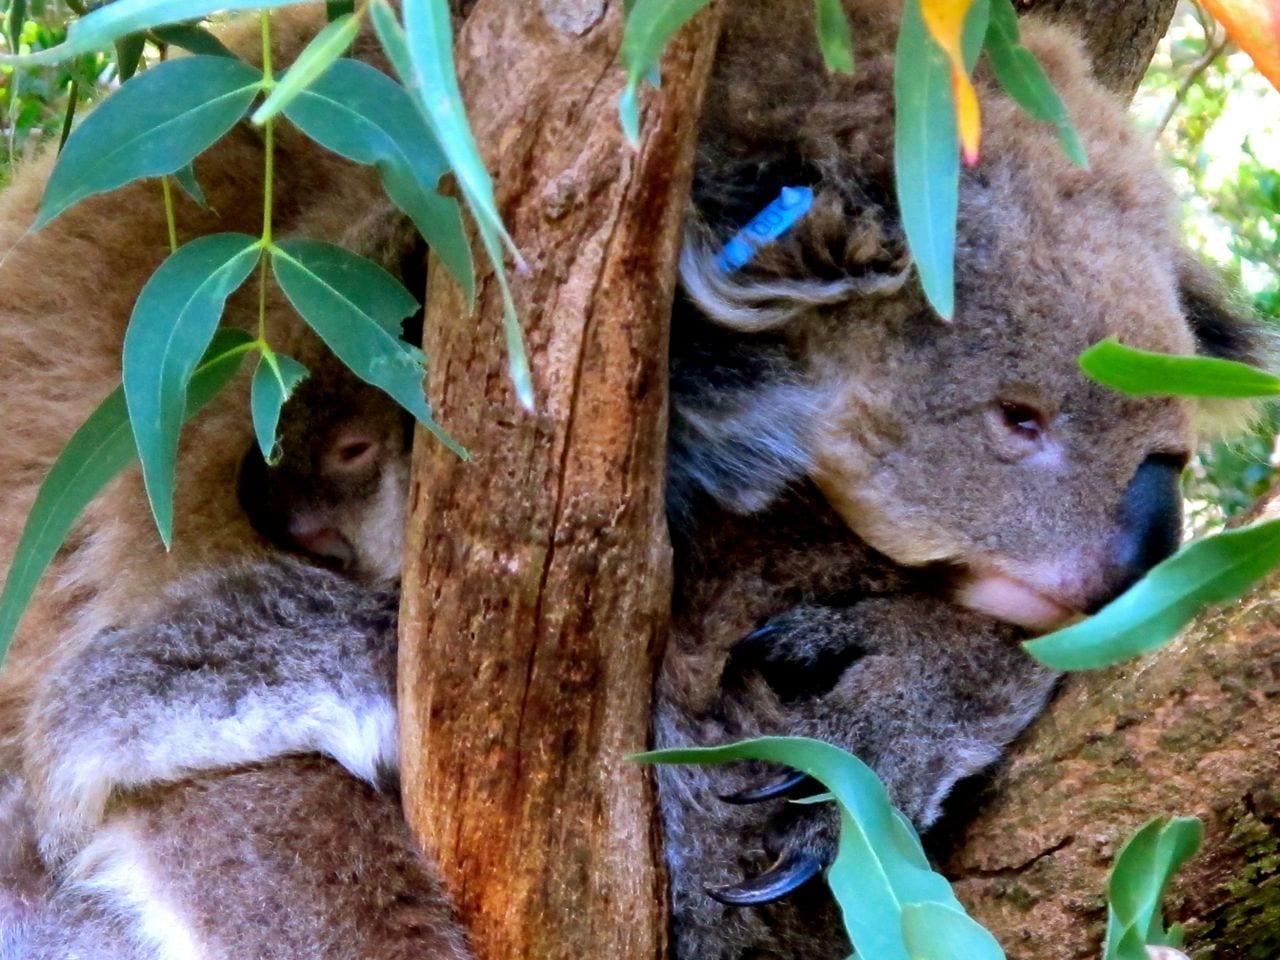 Mama and baby koala, Melbourne, Australia